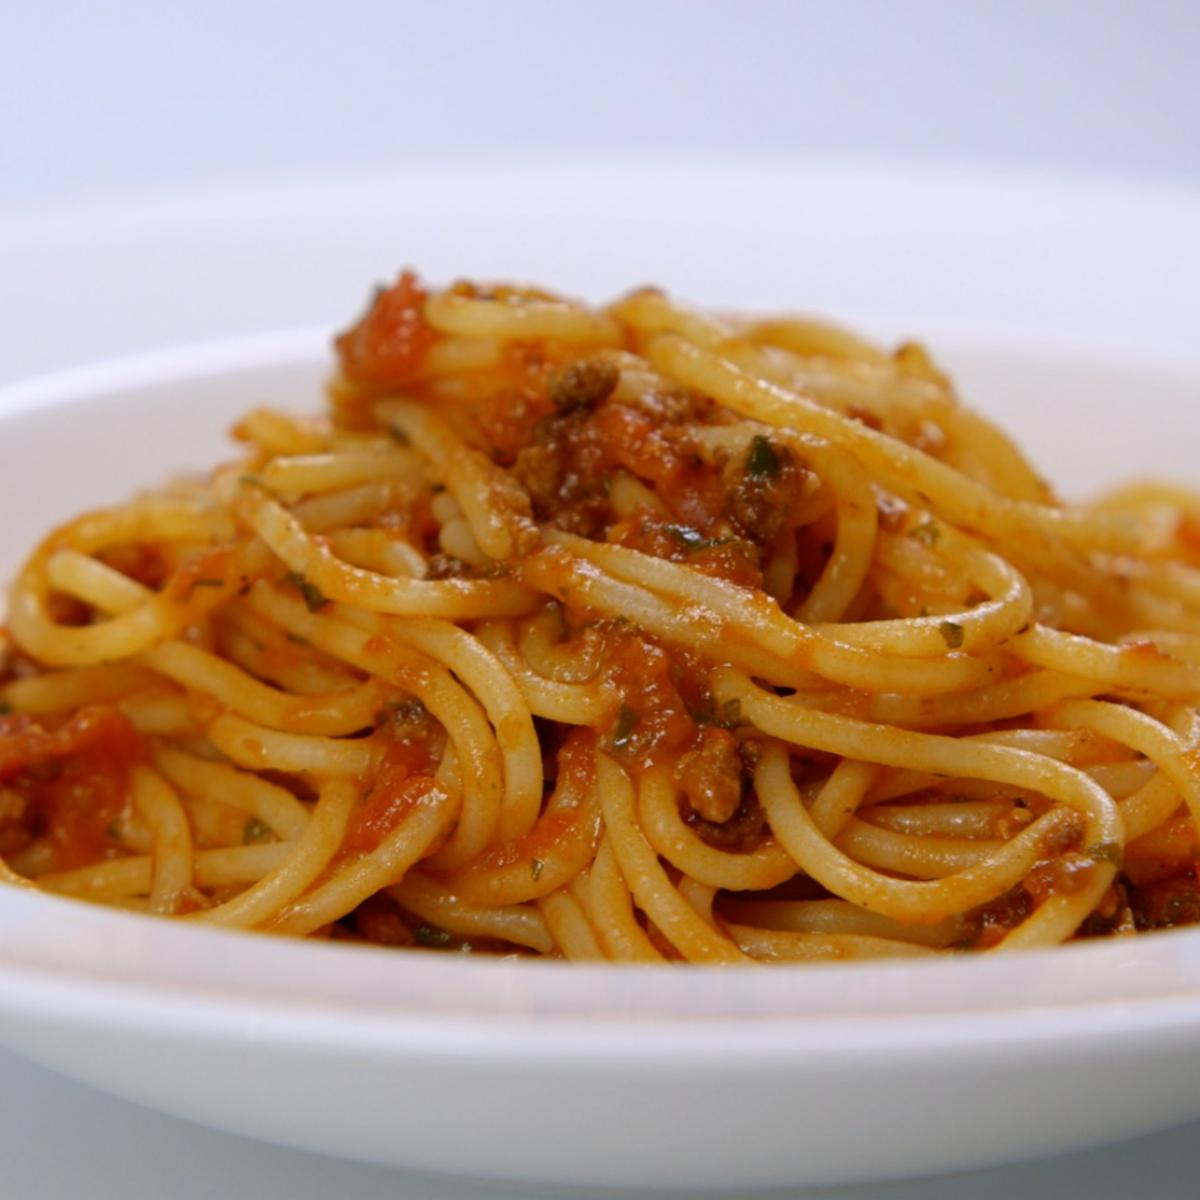 Delia smith pasta bake recipes